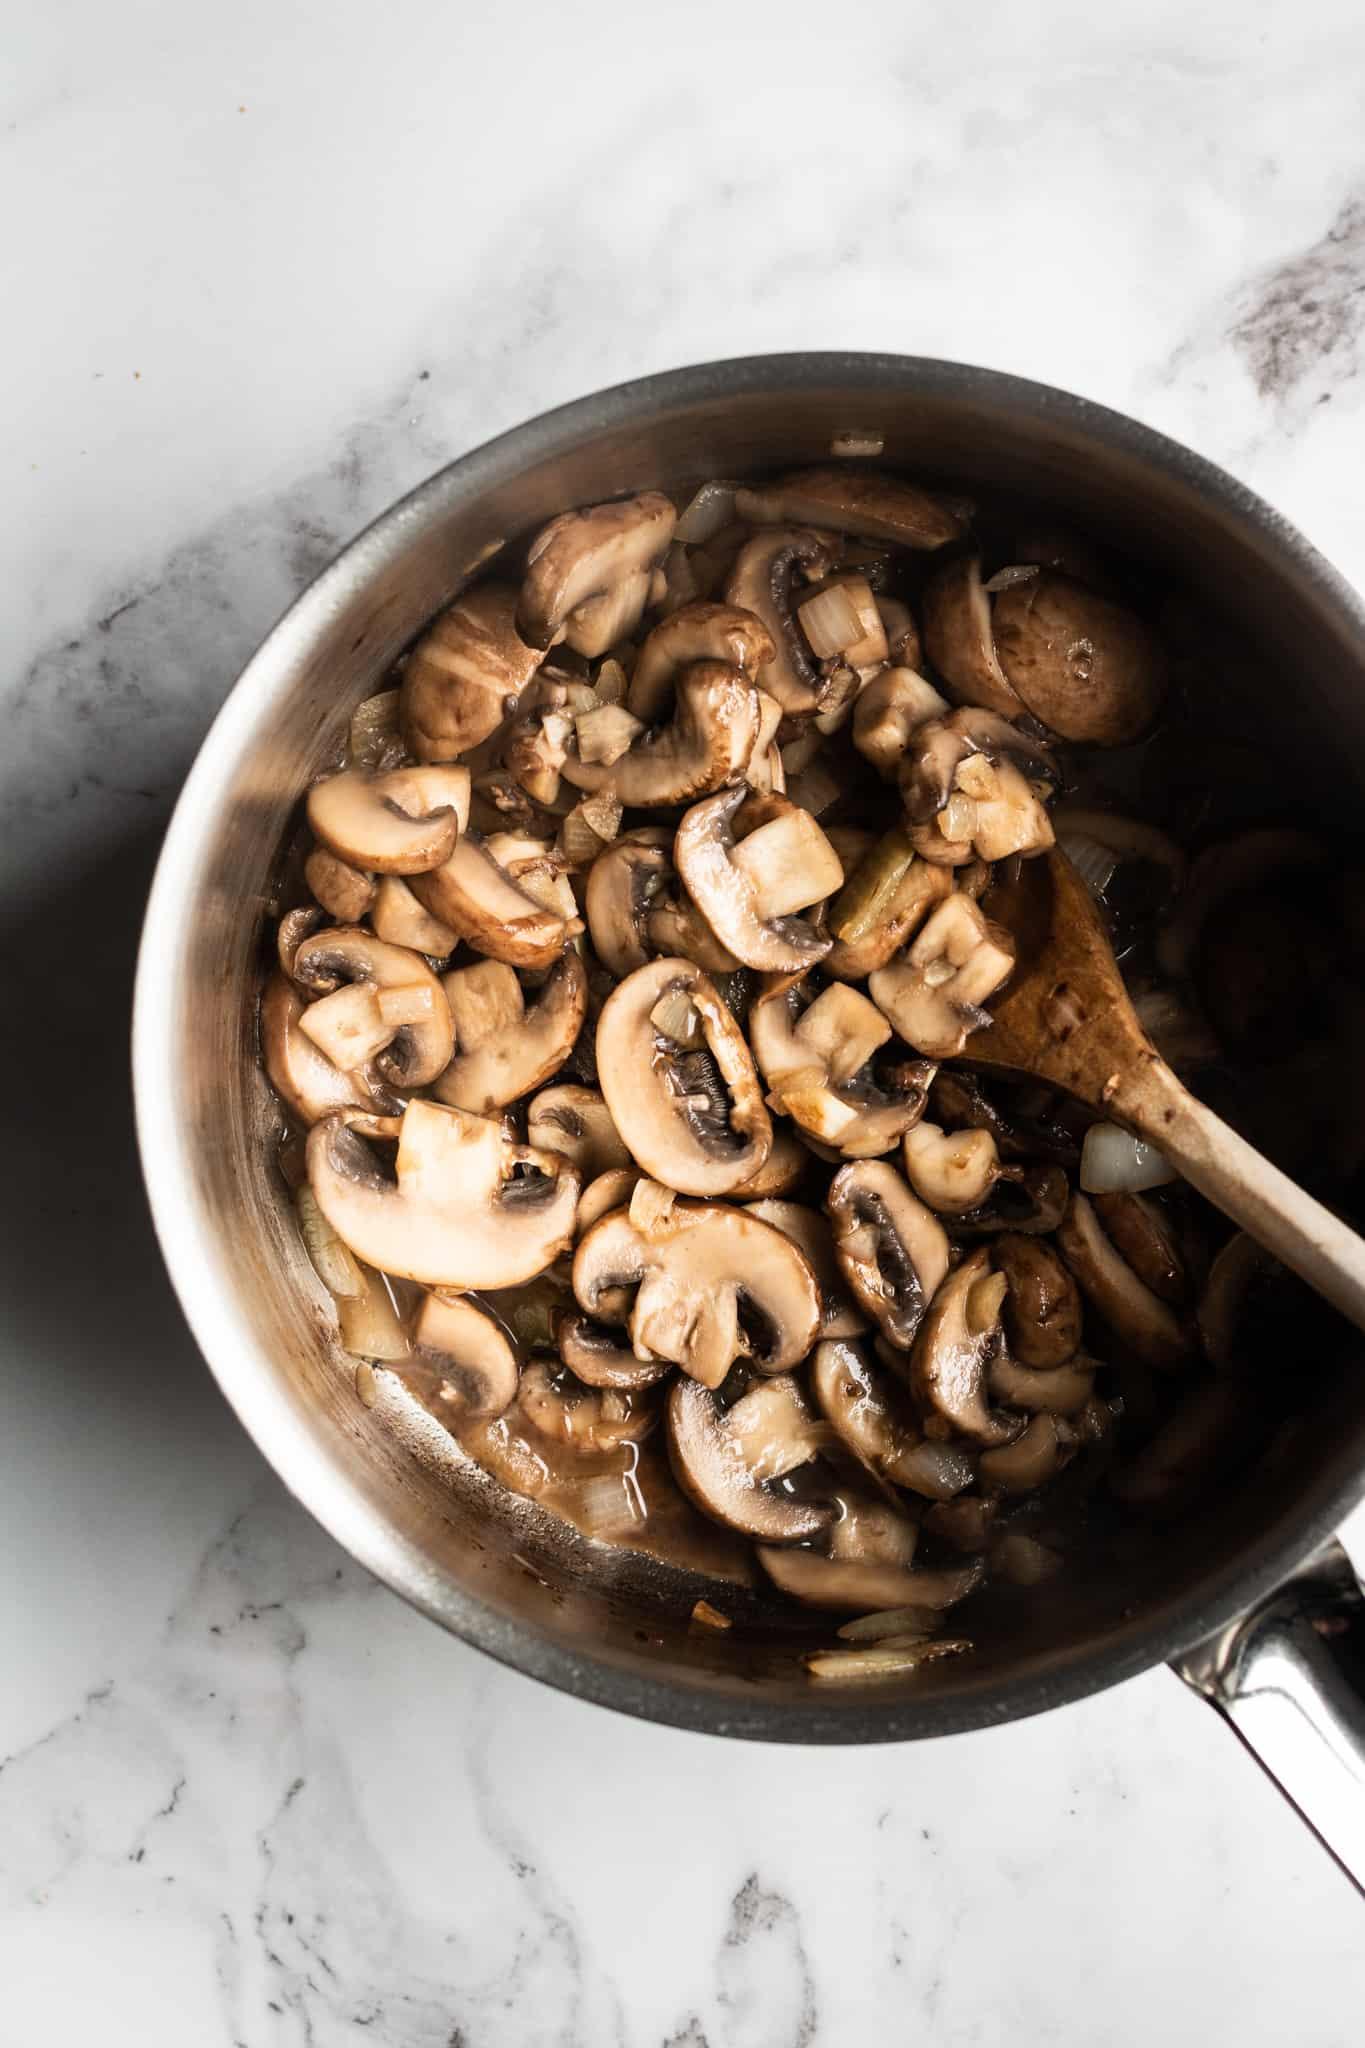 mushrooms cooked in a saucepan